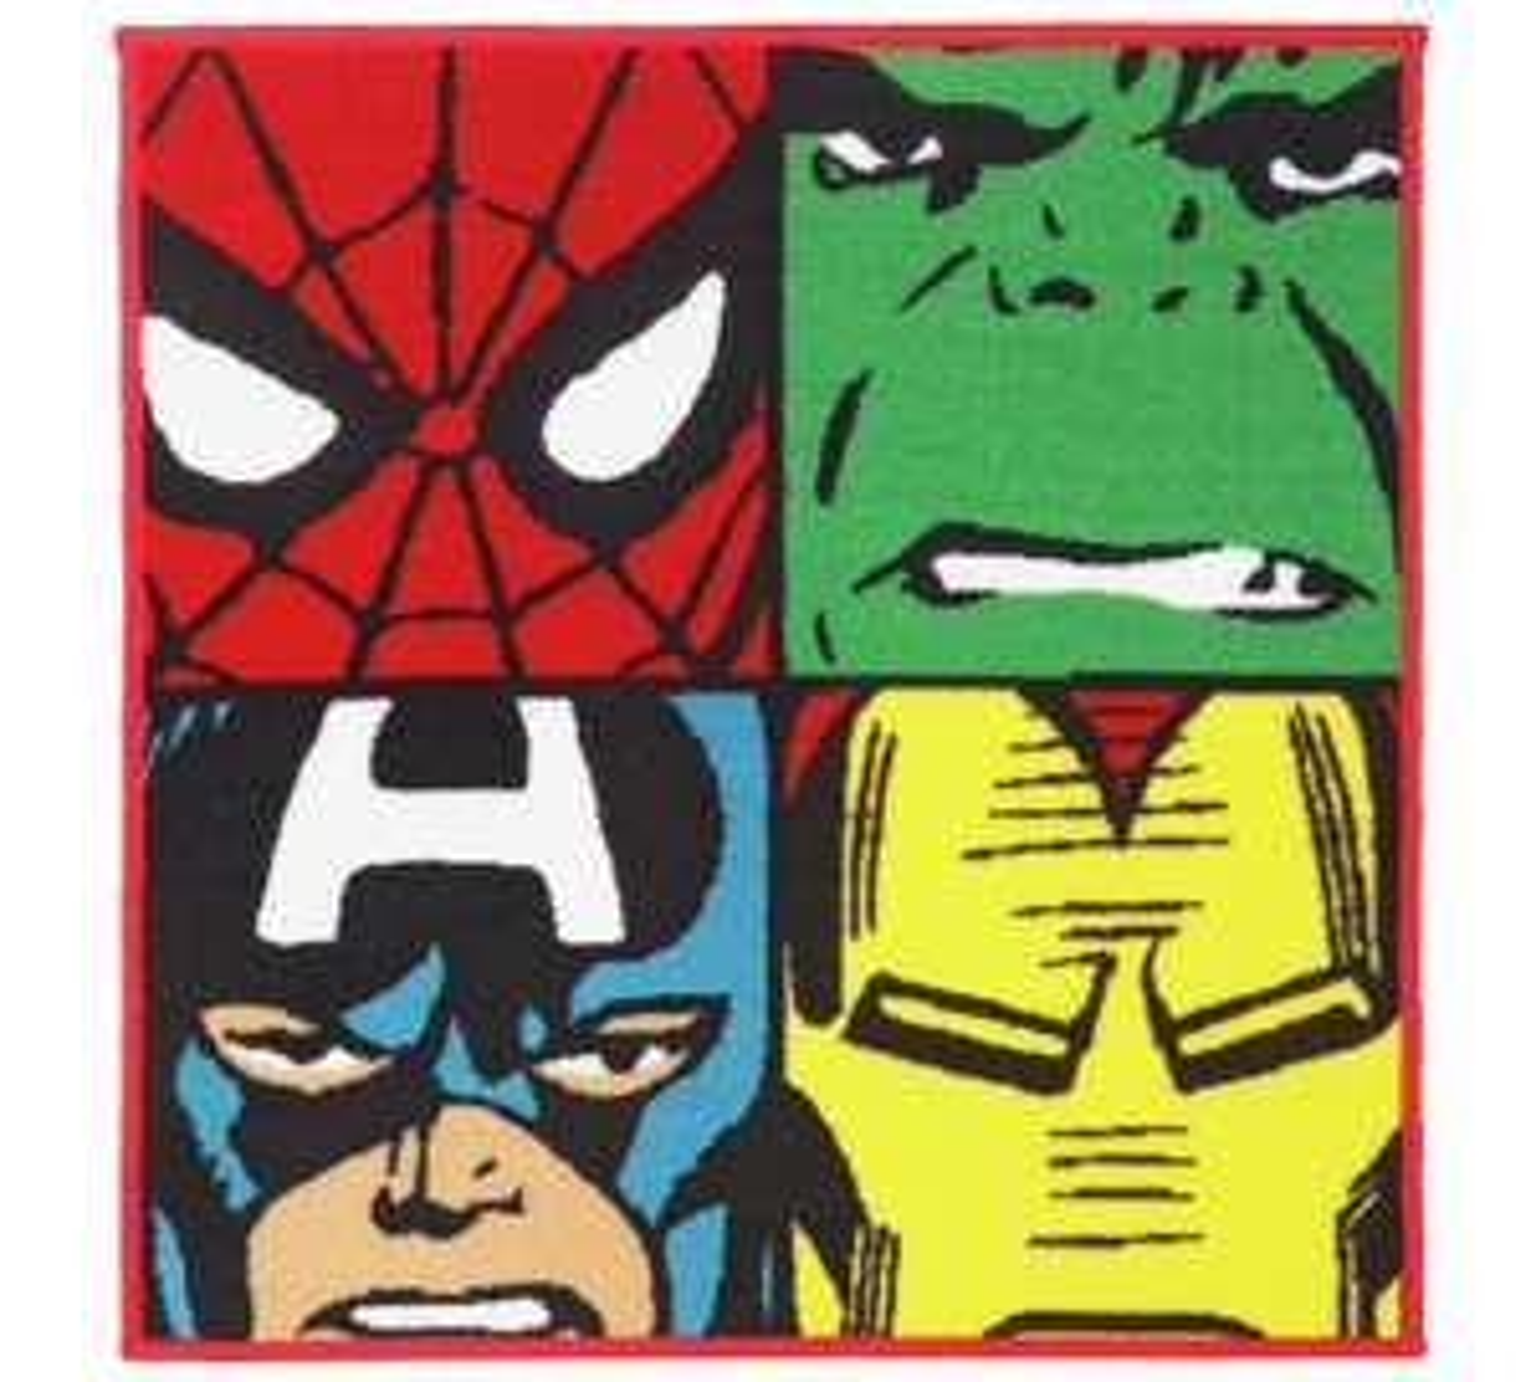 Marvel rug 80cm x 80cm £6.99 at Argos